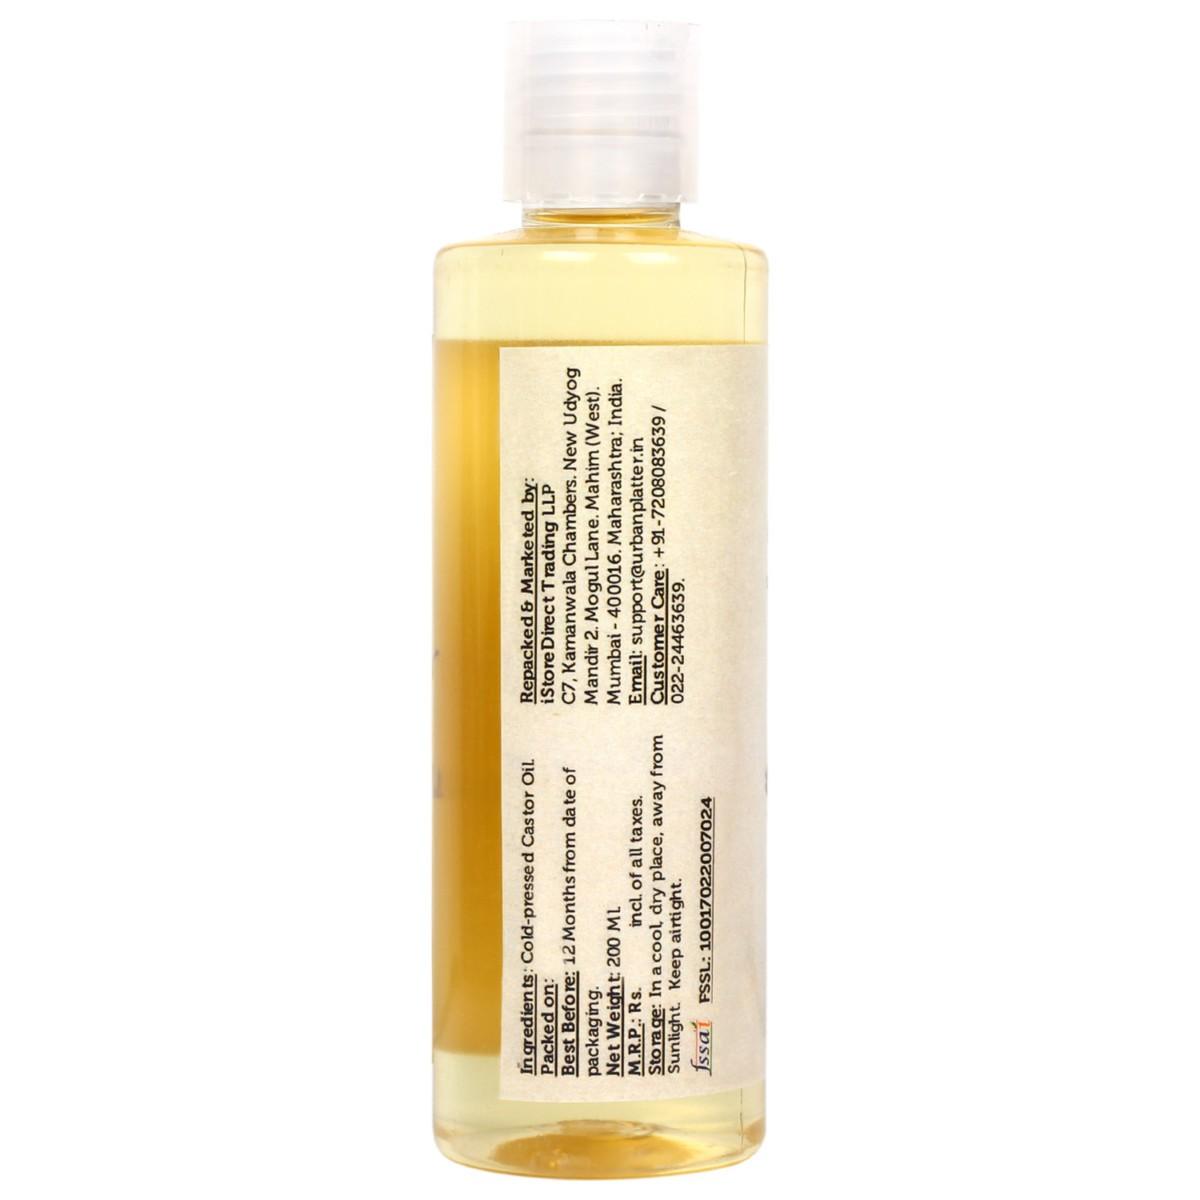 Urban Platter Cold Pressed Castor (Arandi) Oil, 200 ML [Food-grade, Great  for Skin & Hair, Moisturizing & Healing]